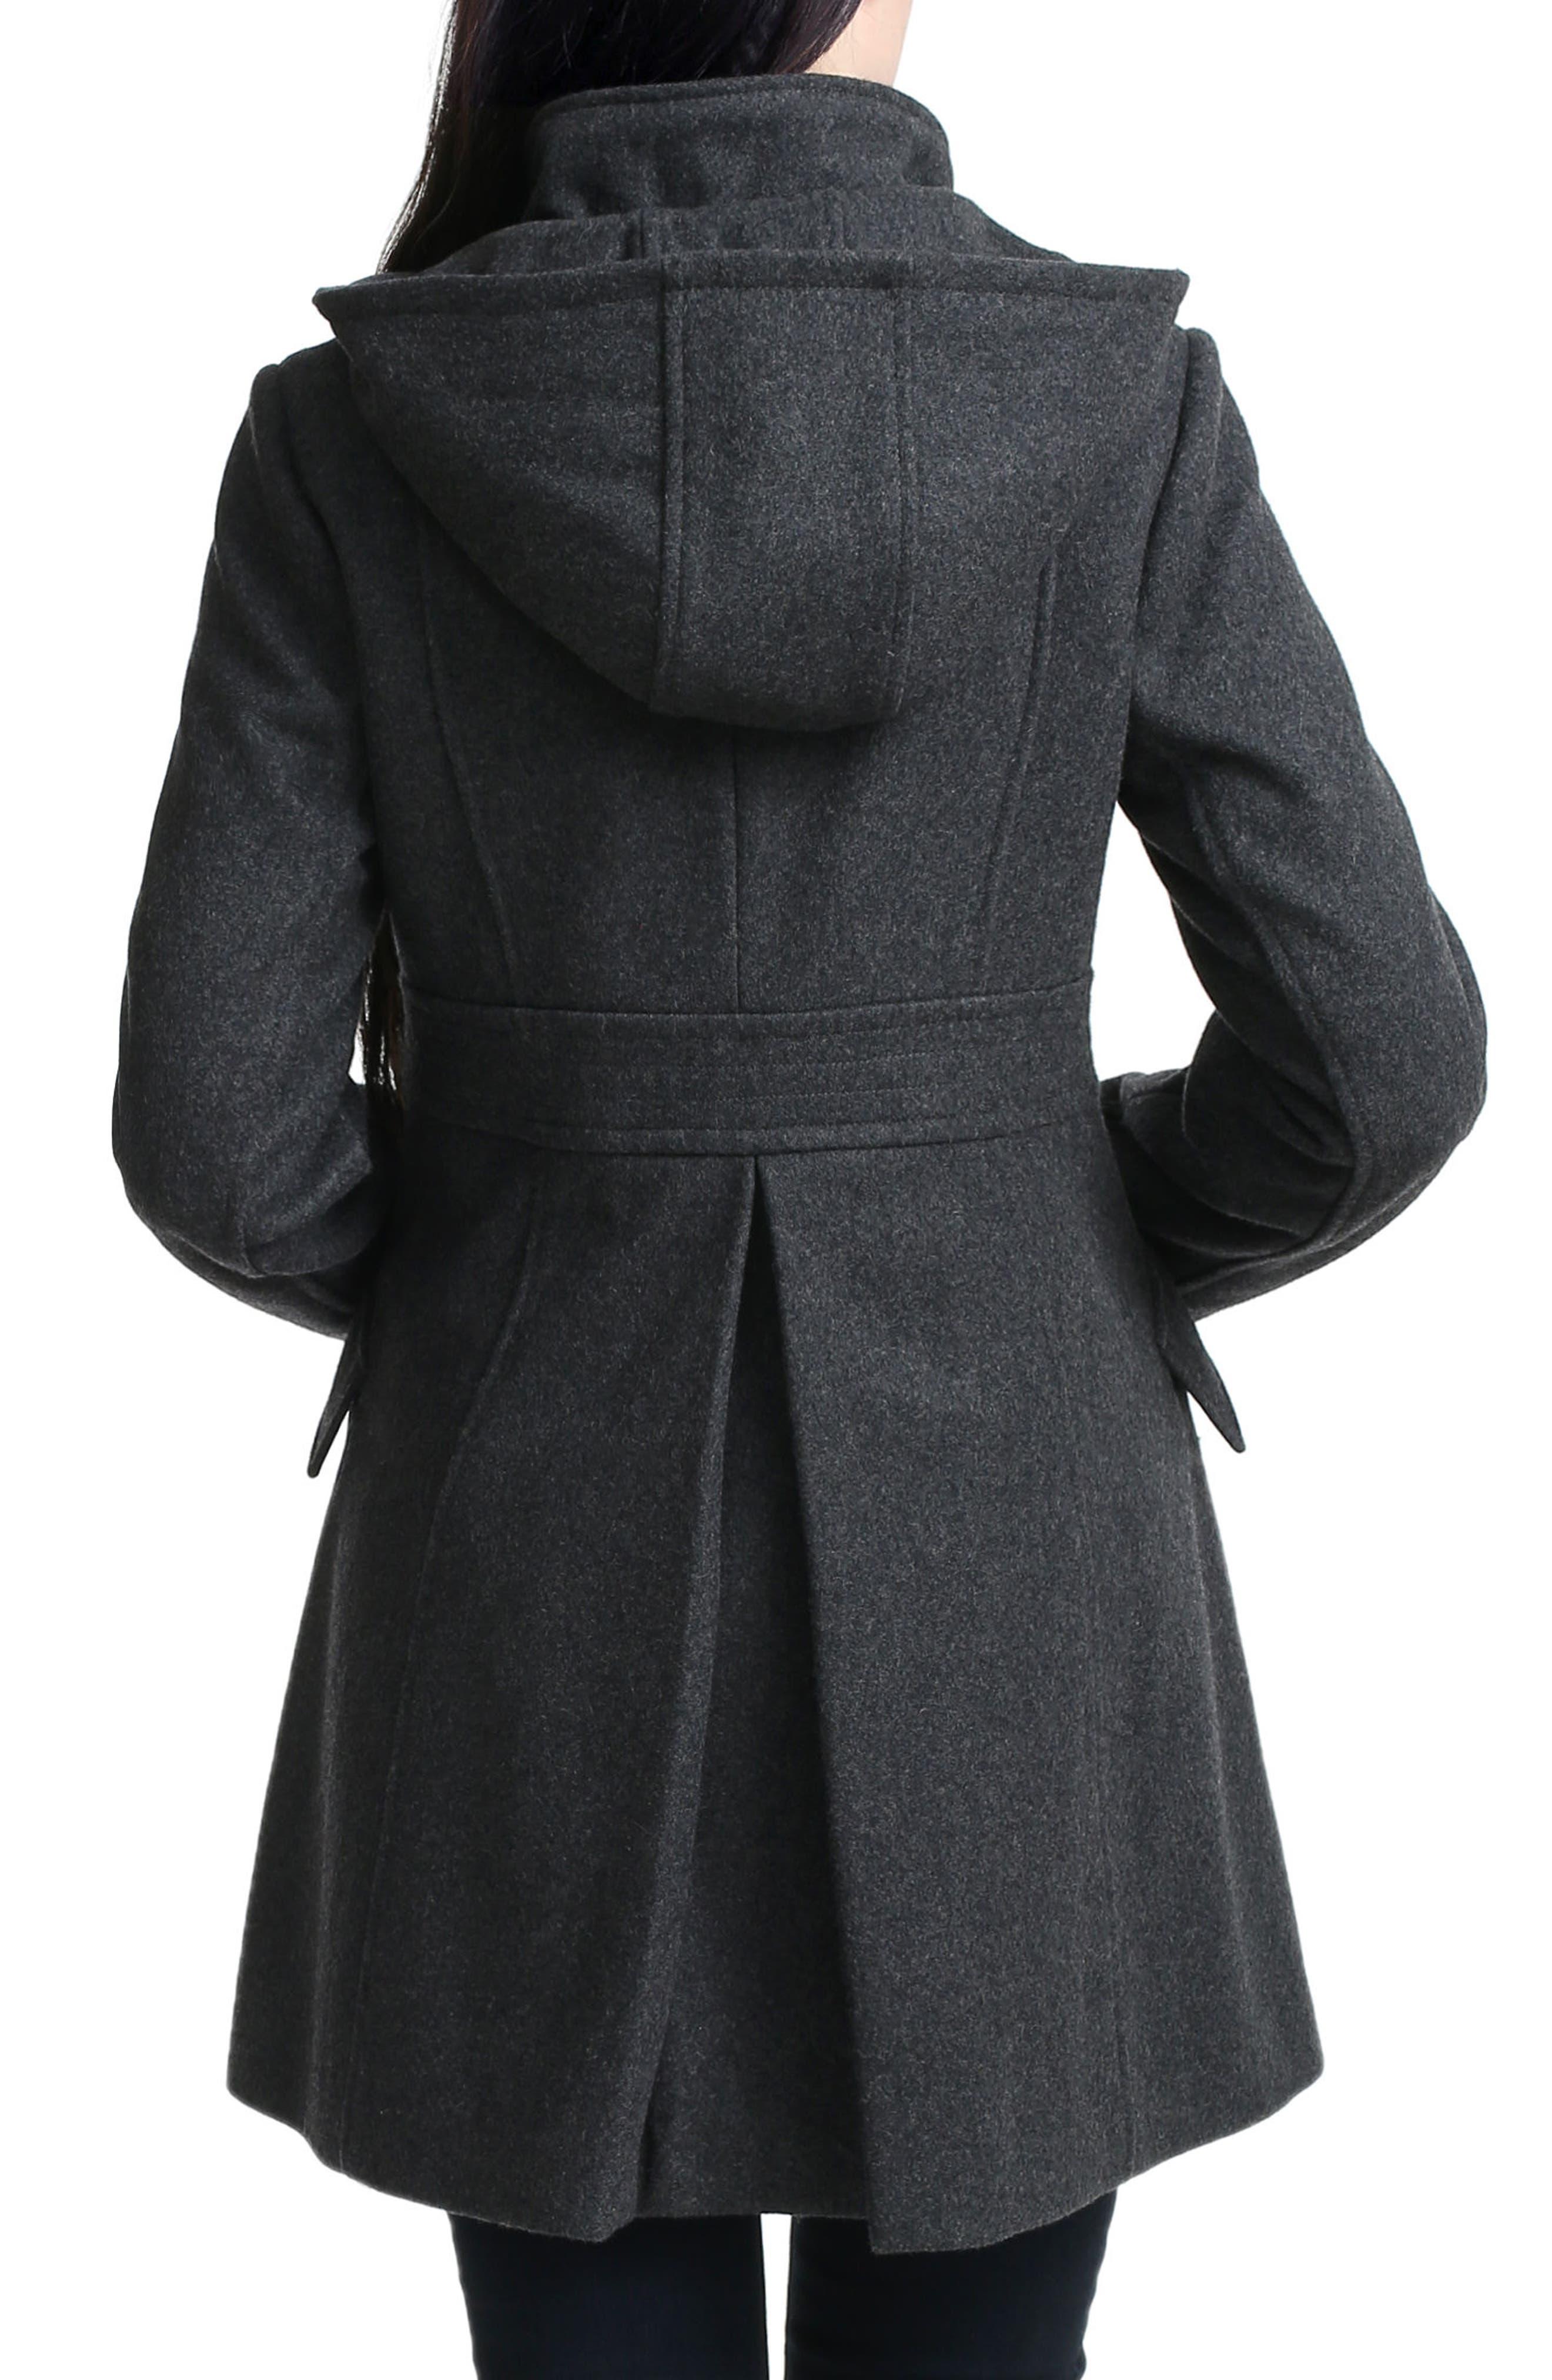 KIMI AND KAI, Cordella Wool Blend Hooded Maternity Coat, Alternate thumbnail 2, color, DARK HEATHER GRAY